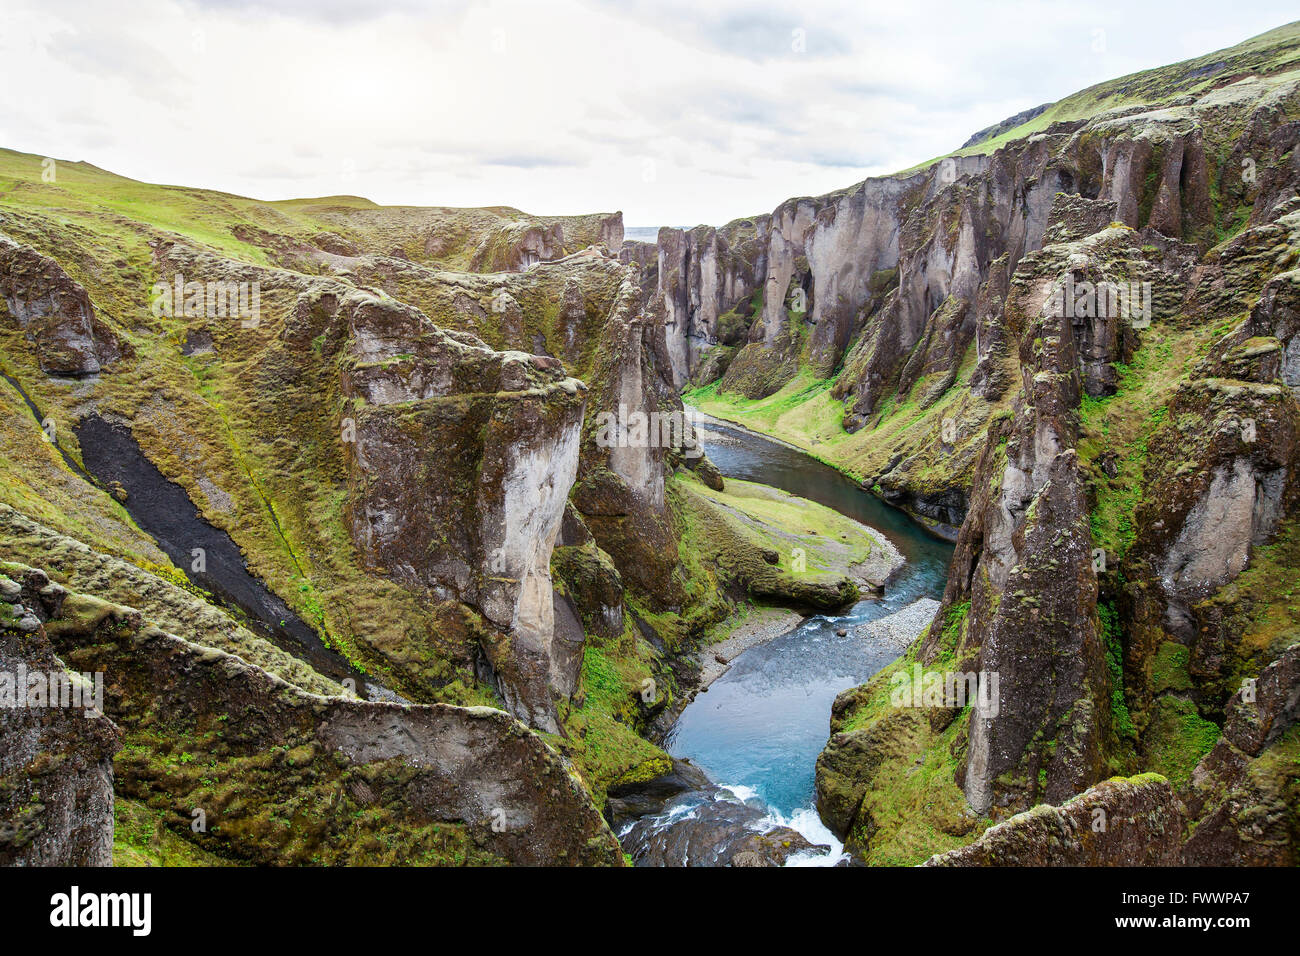 Fjadrargljufur canyon, nature of Iceland, beautiful landscape - Stock Image